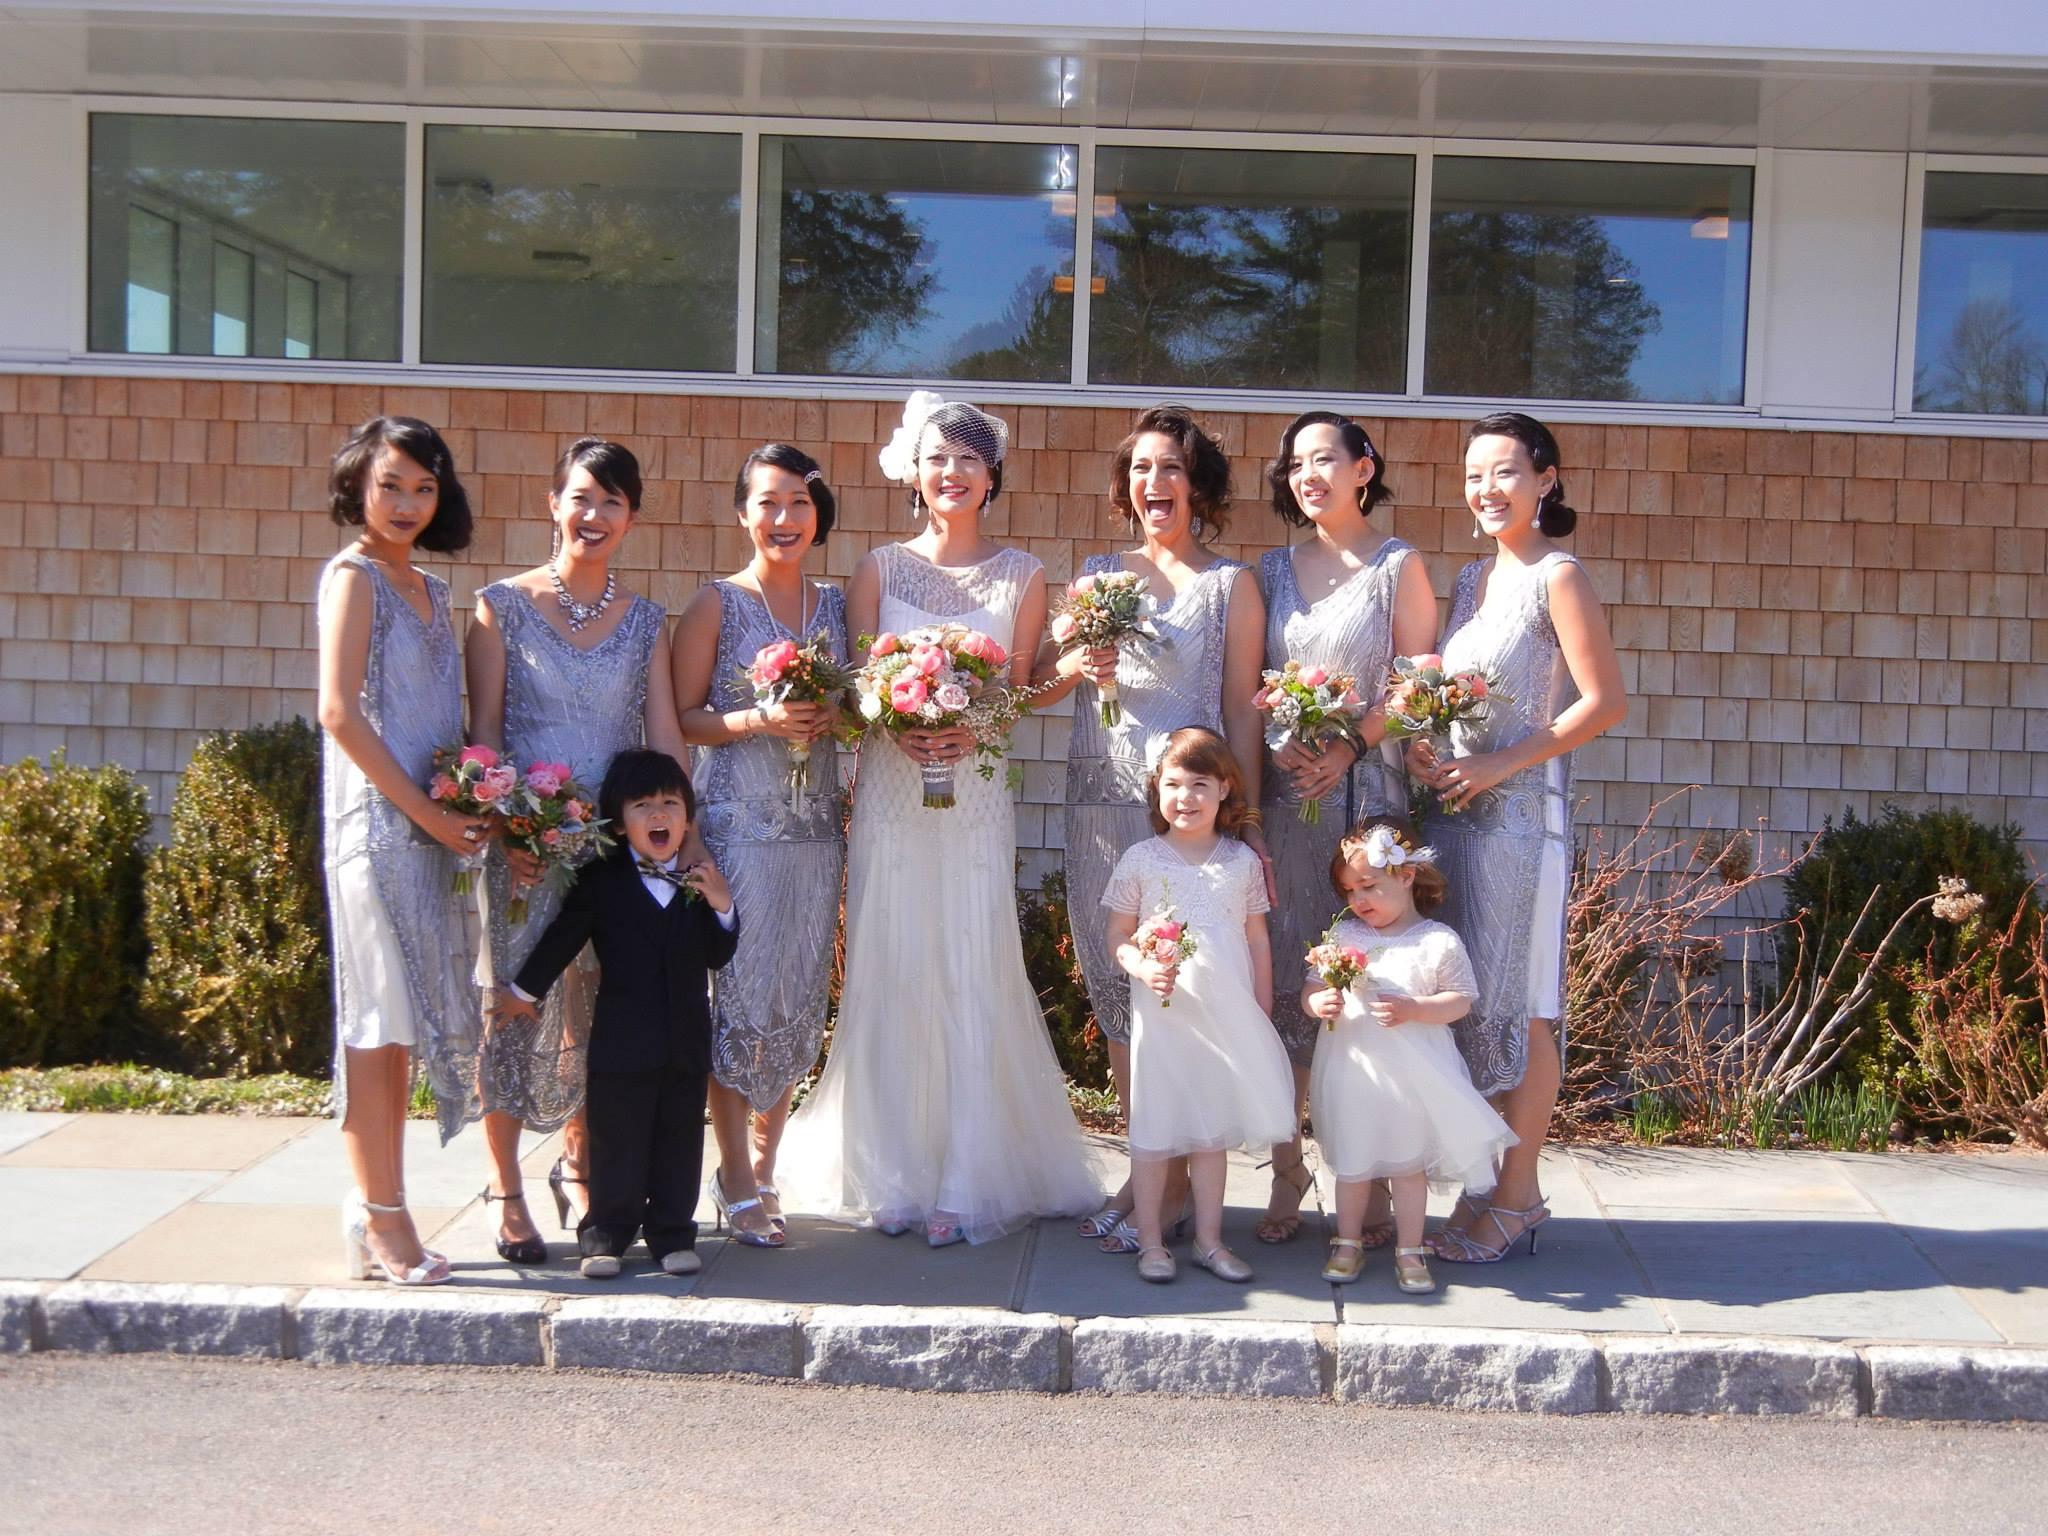 Bettina's wedding